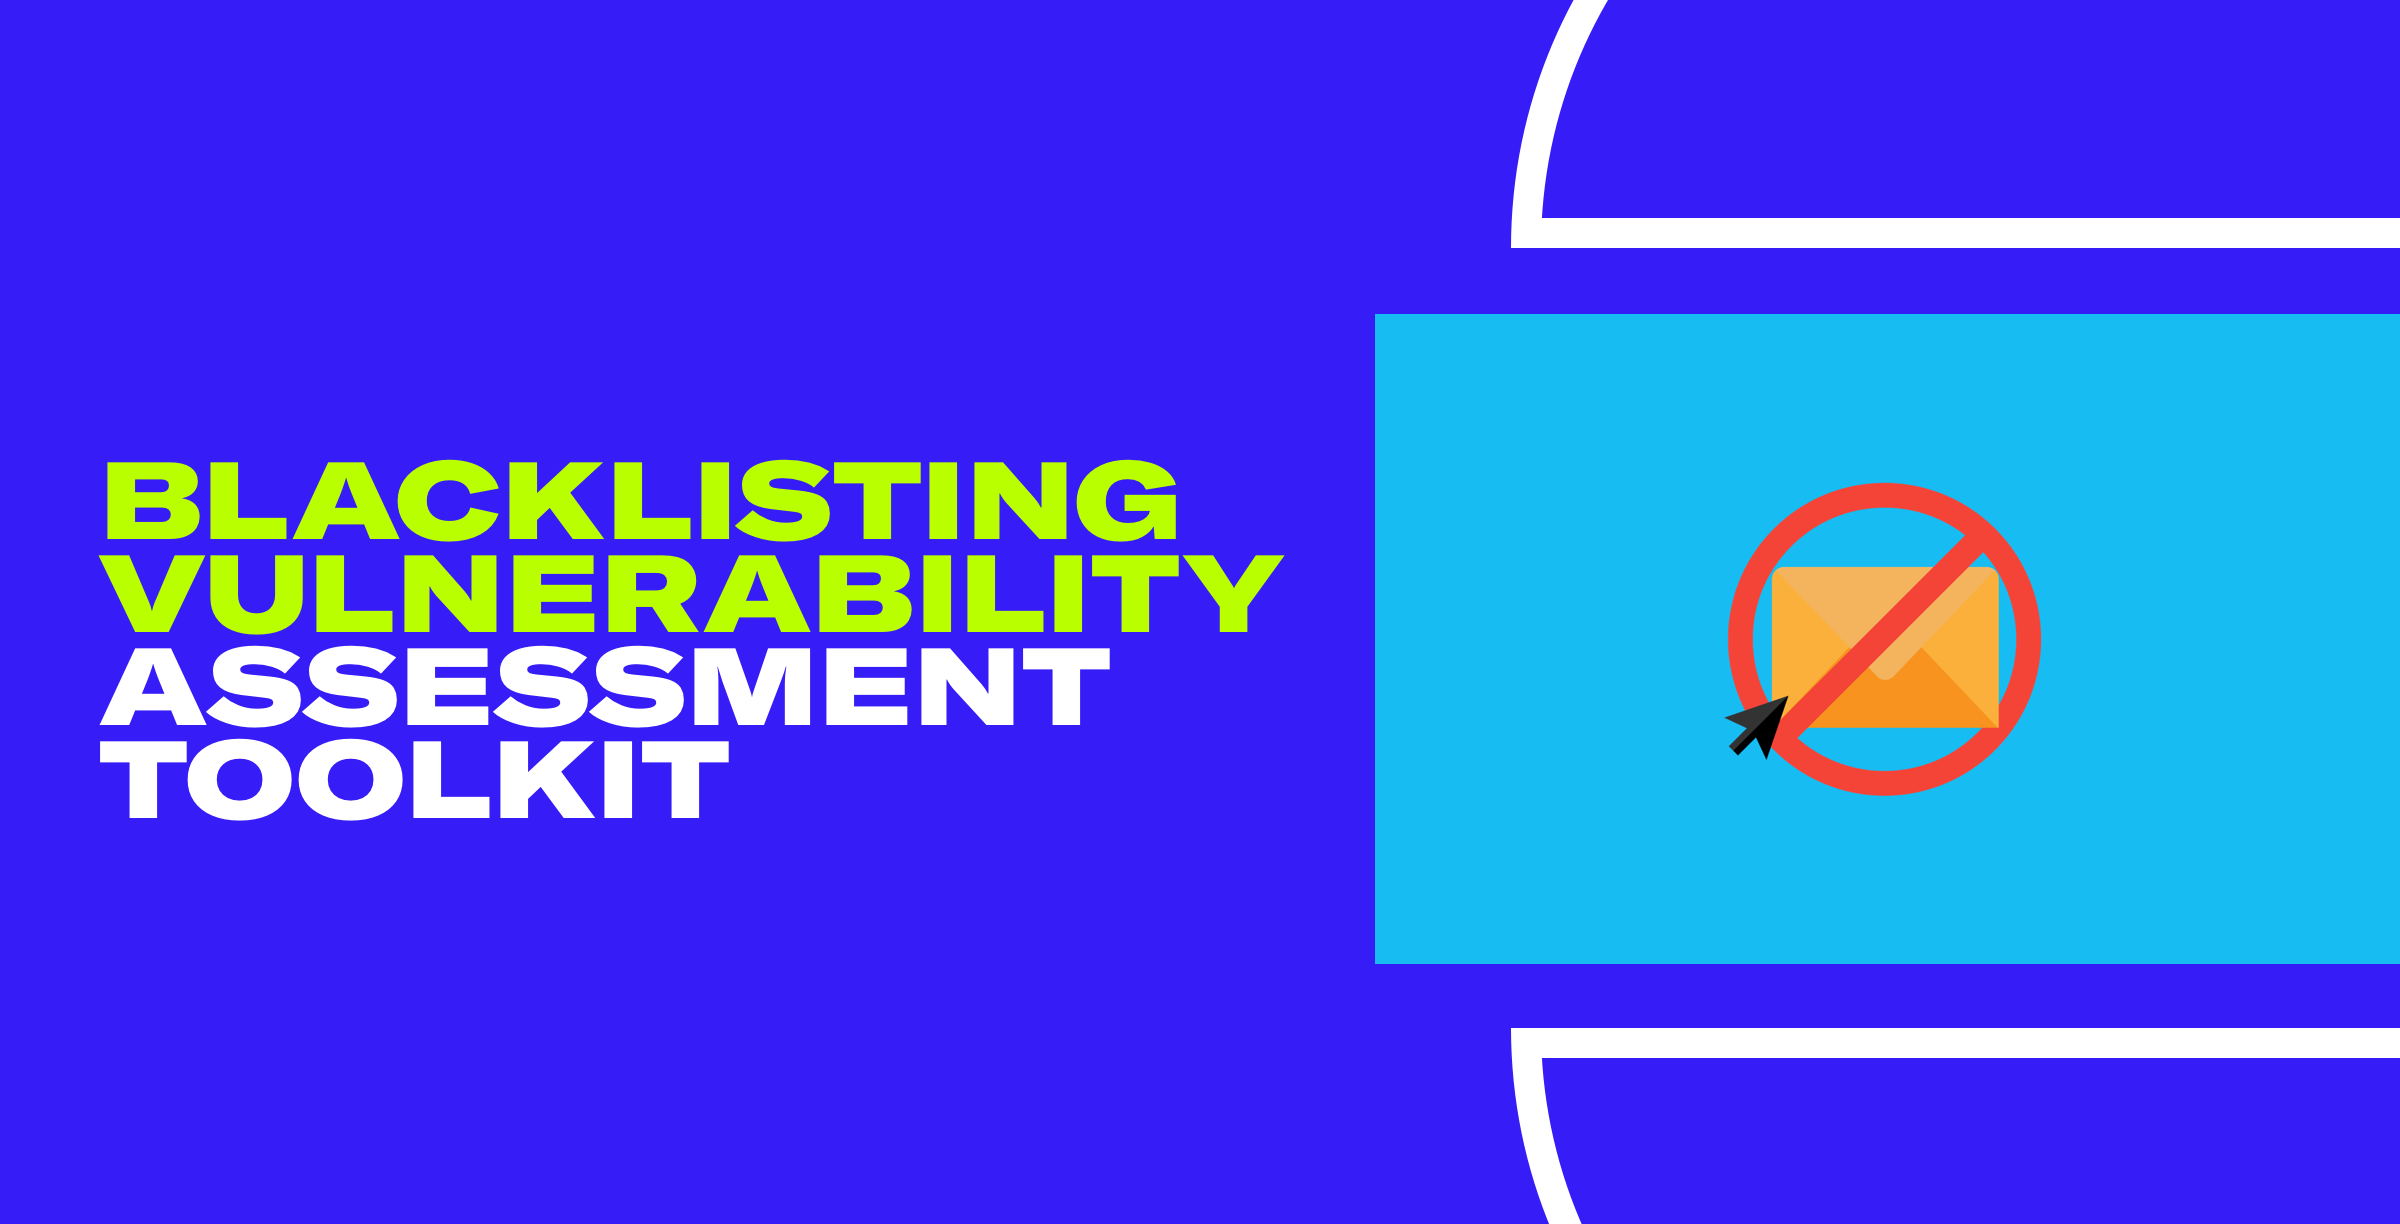 Blacklisting Vulnerability Assessment Toolkit_Email Header1.png